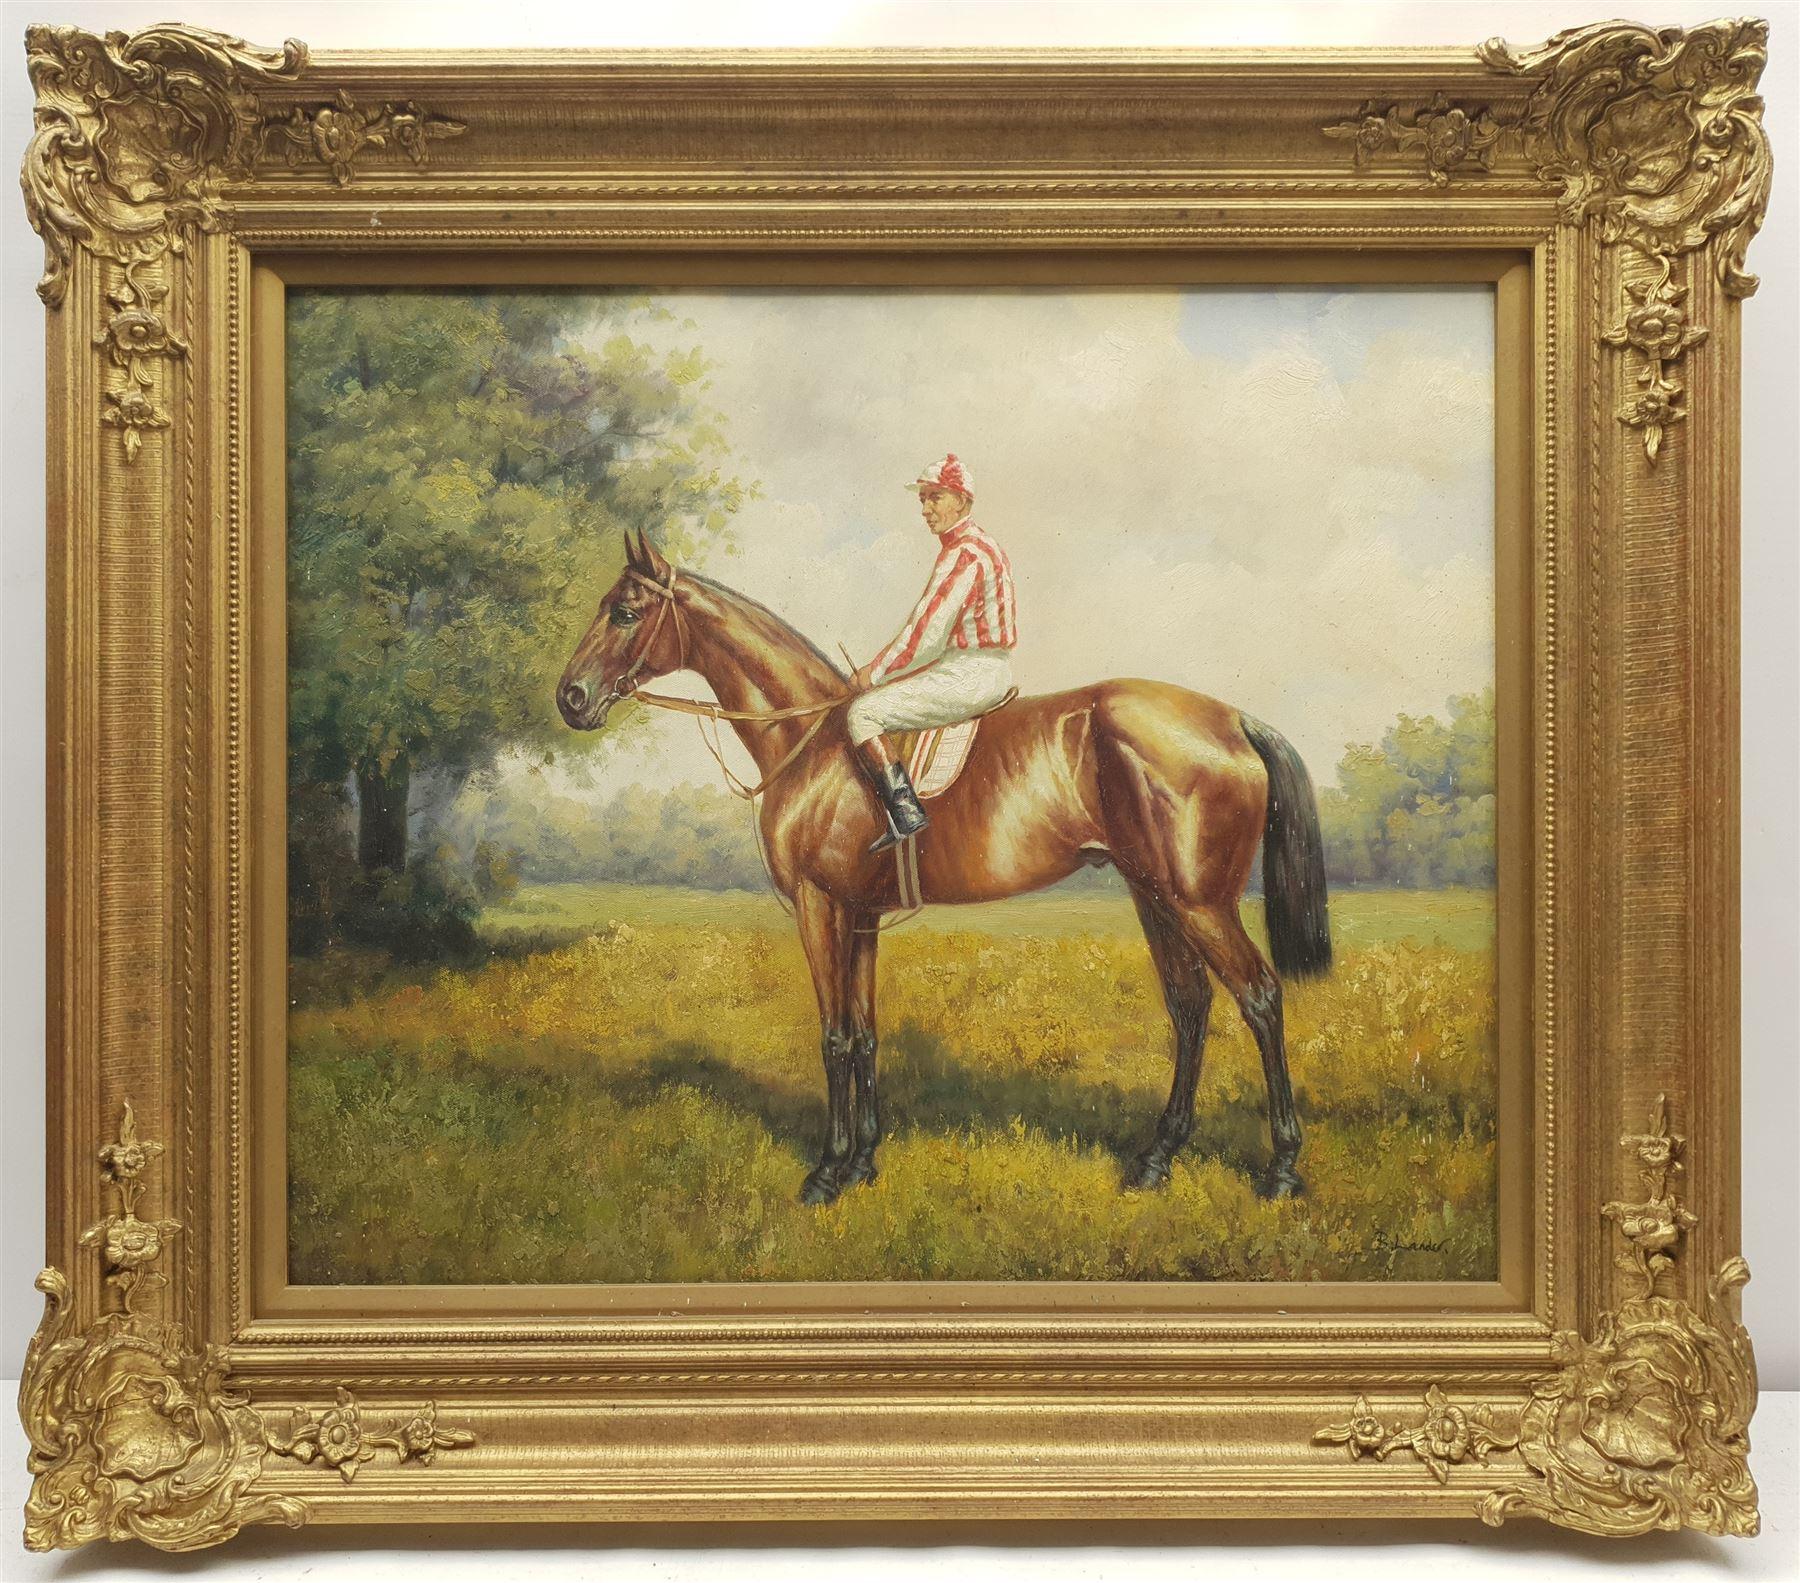 After Benjamin Lander (1842-1915): Mounted Jockey - Image 2 of 2